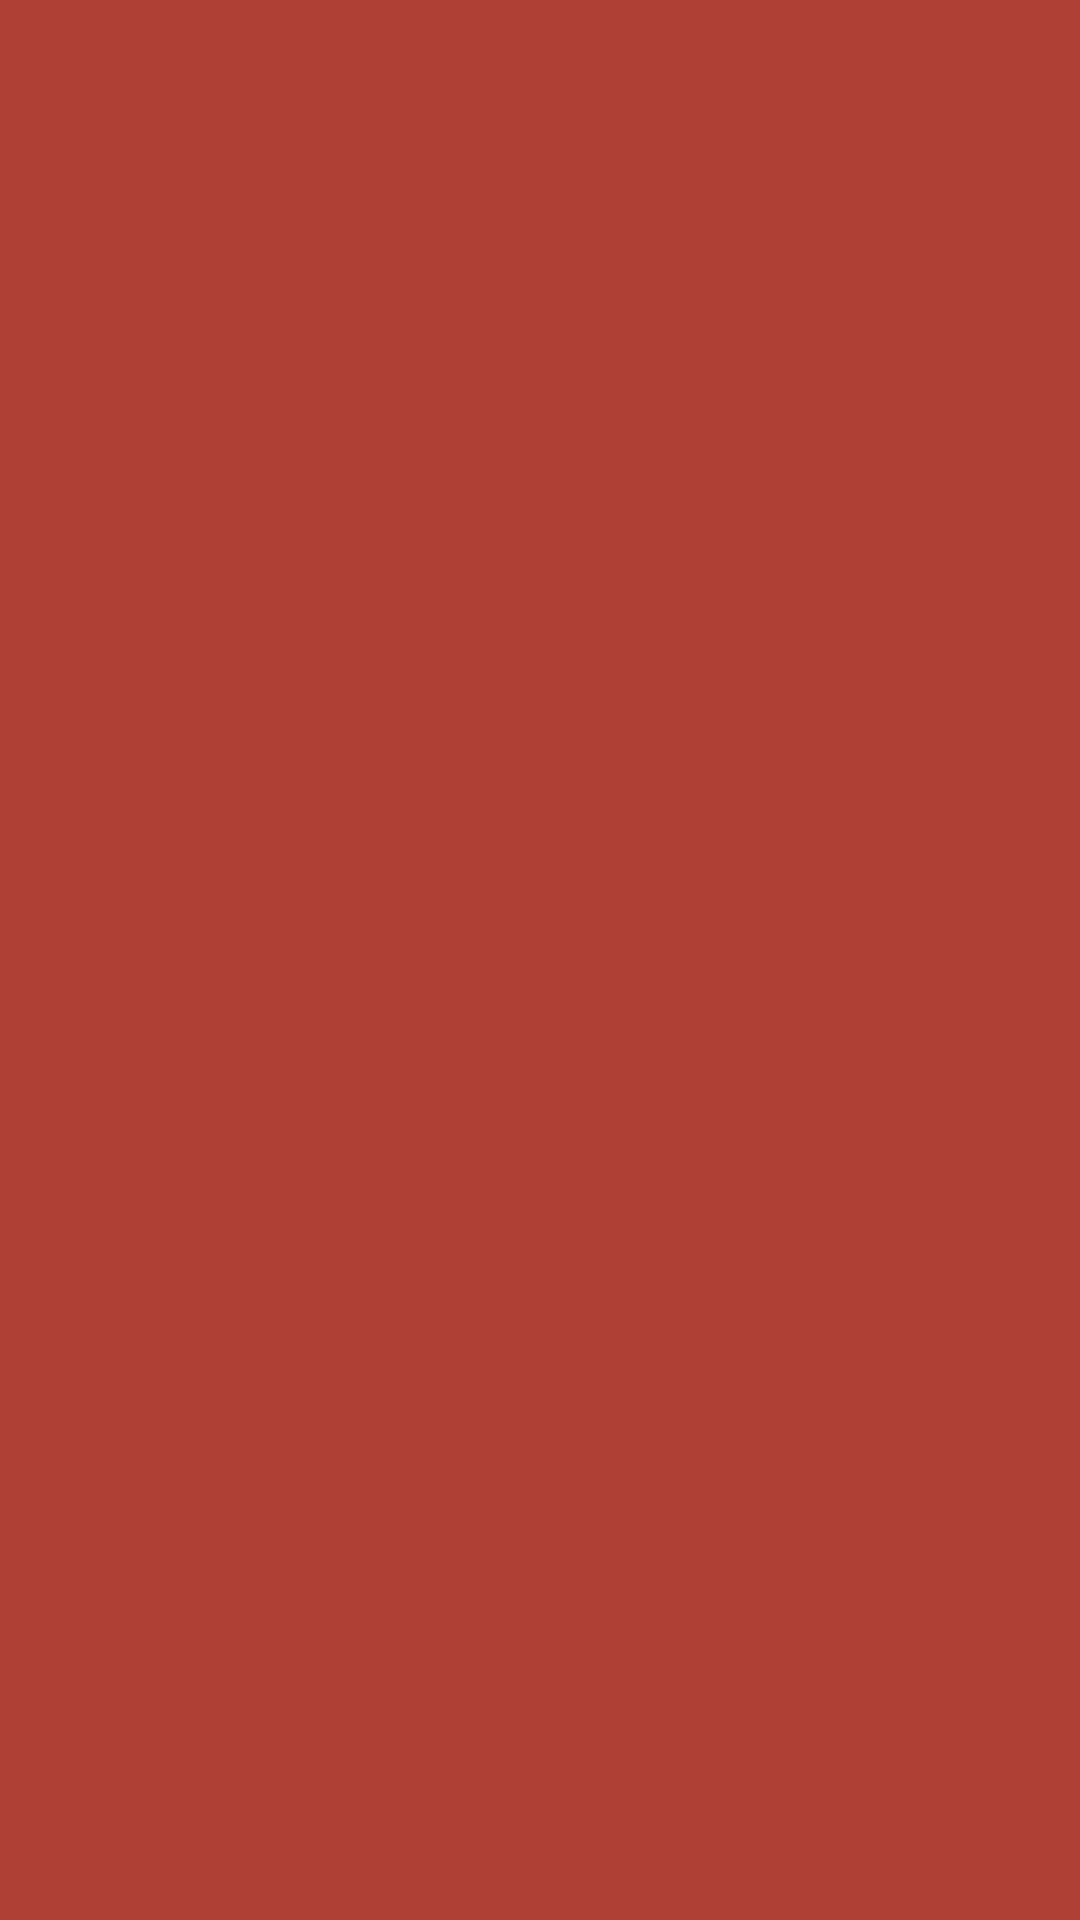 1080x1920 Pale Carmine Solid Color Background